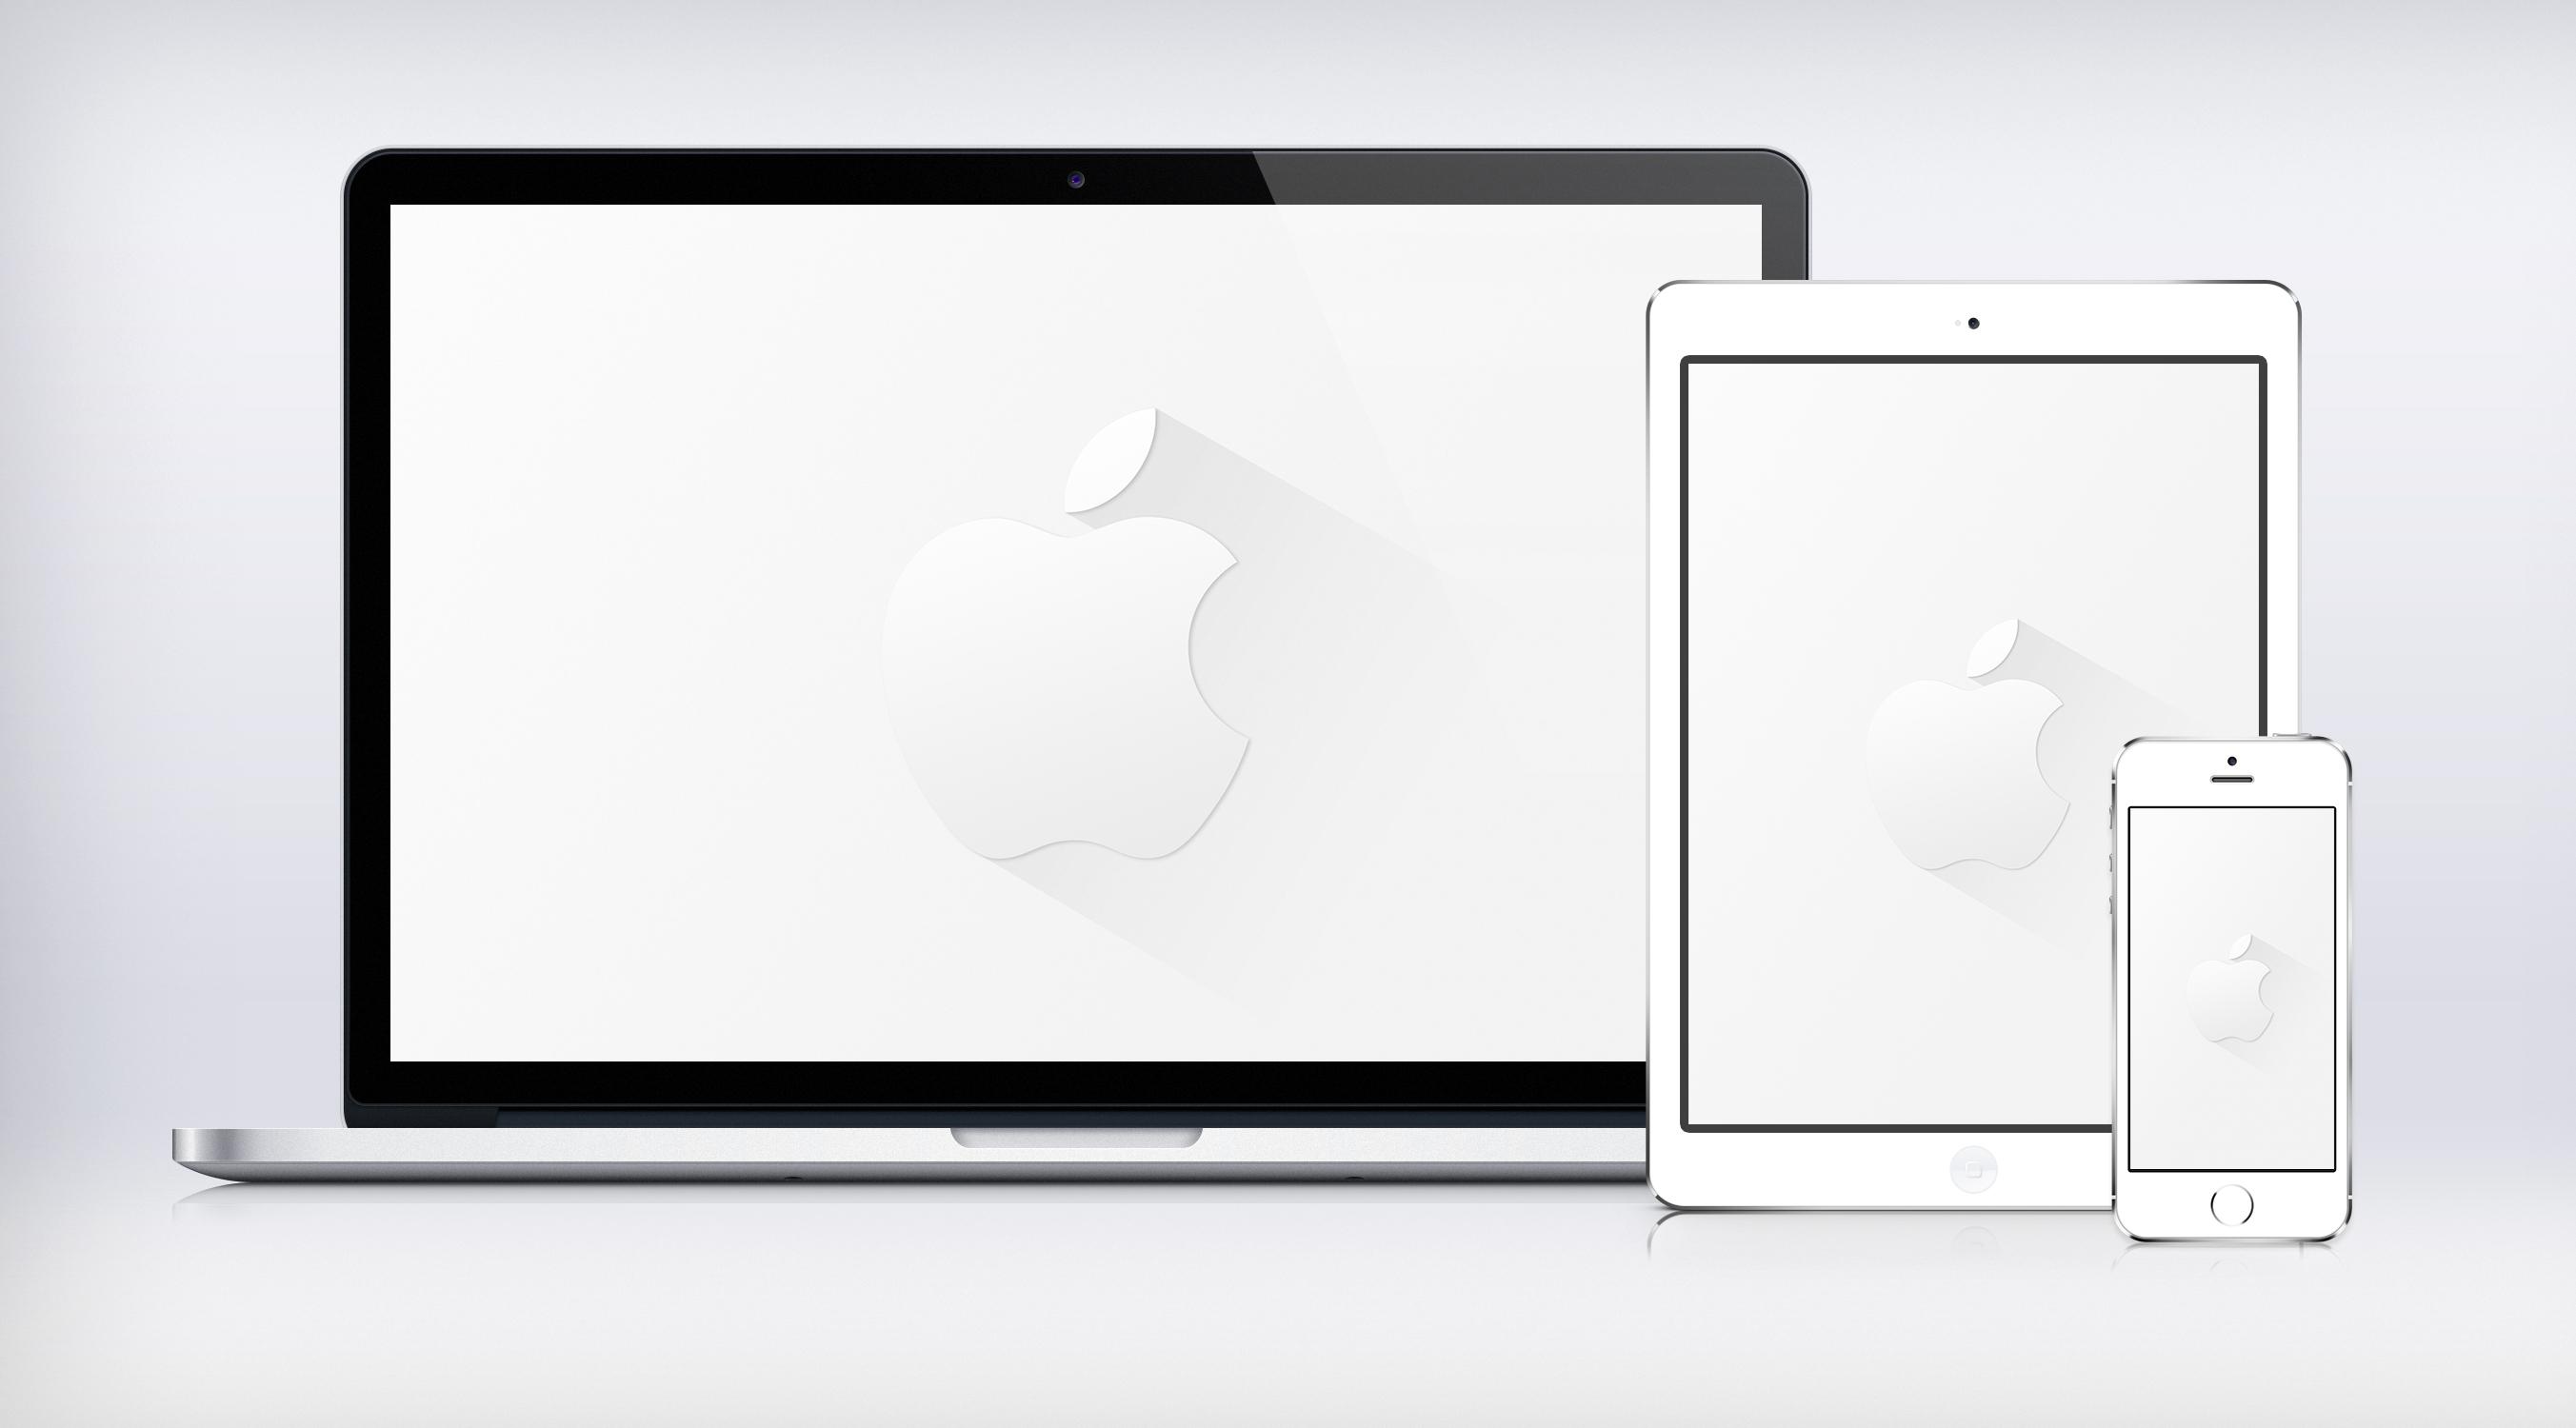 Wallpaper para o evento da Apple